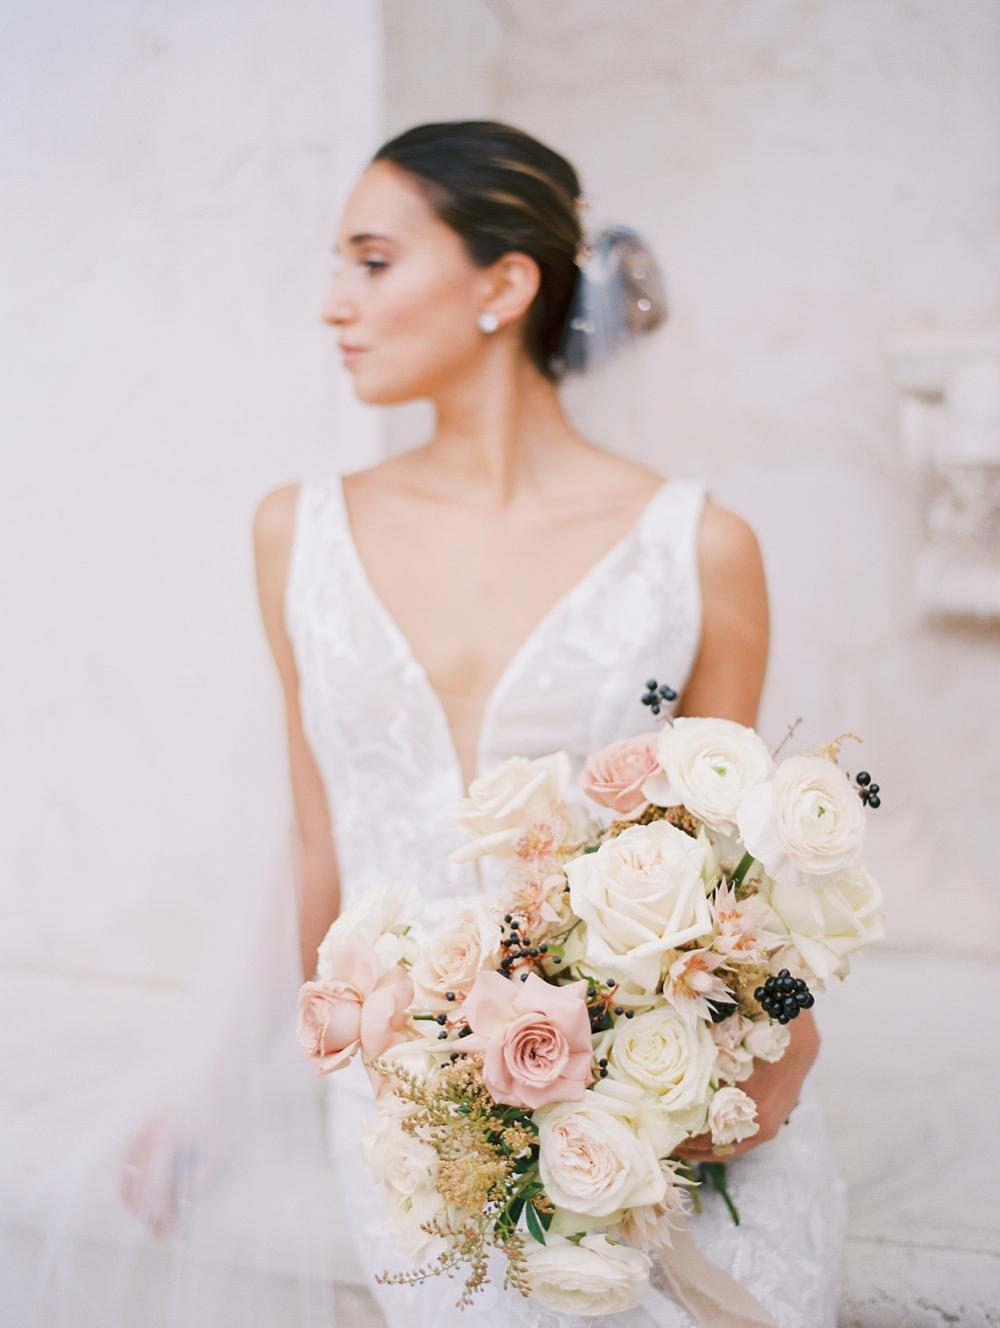 kristin-la-voie-photography-Austin-Wedding-Photographer-Villa-Antonia-332